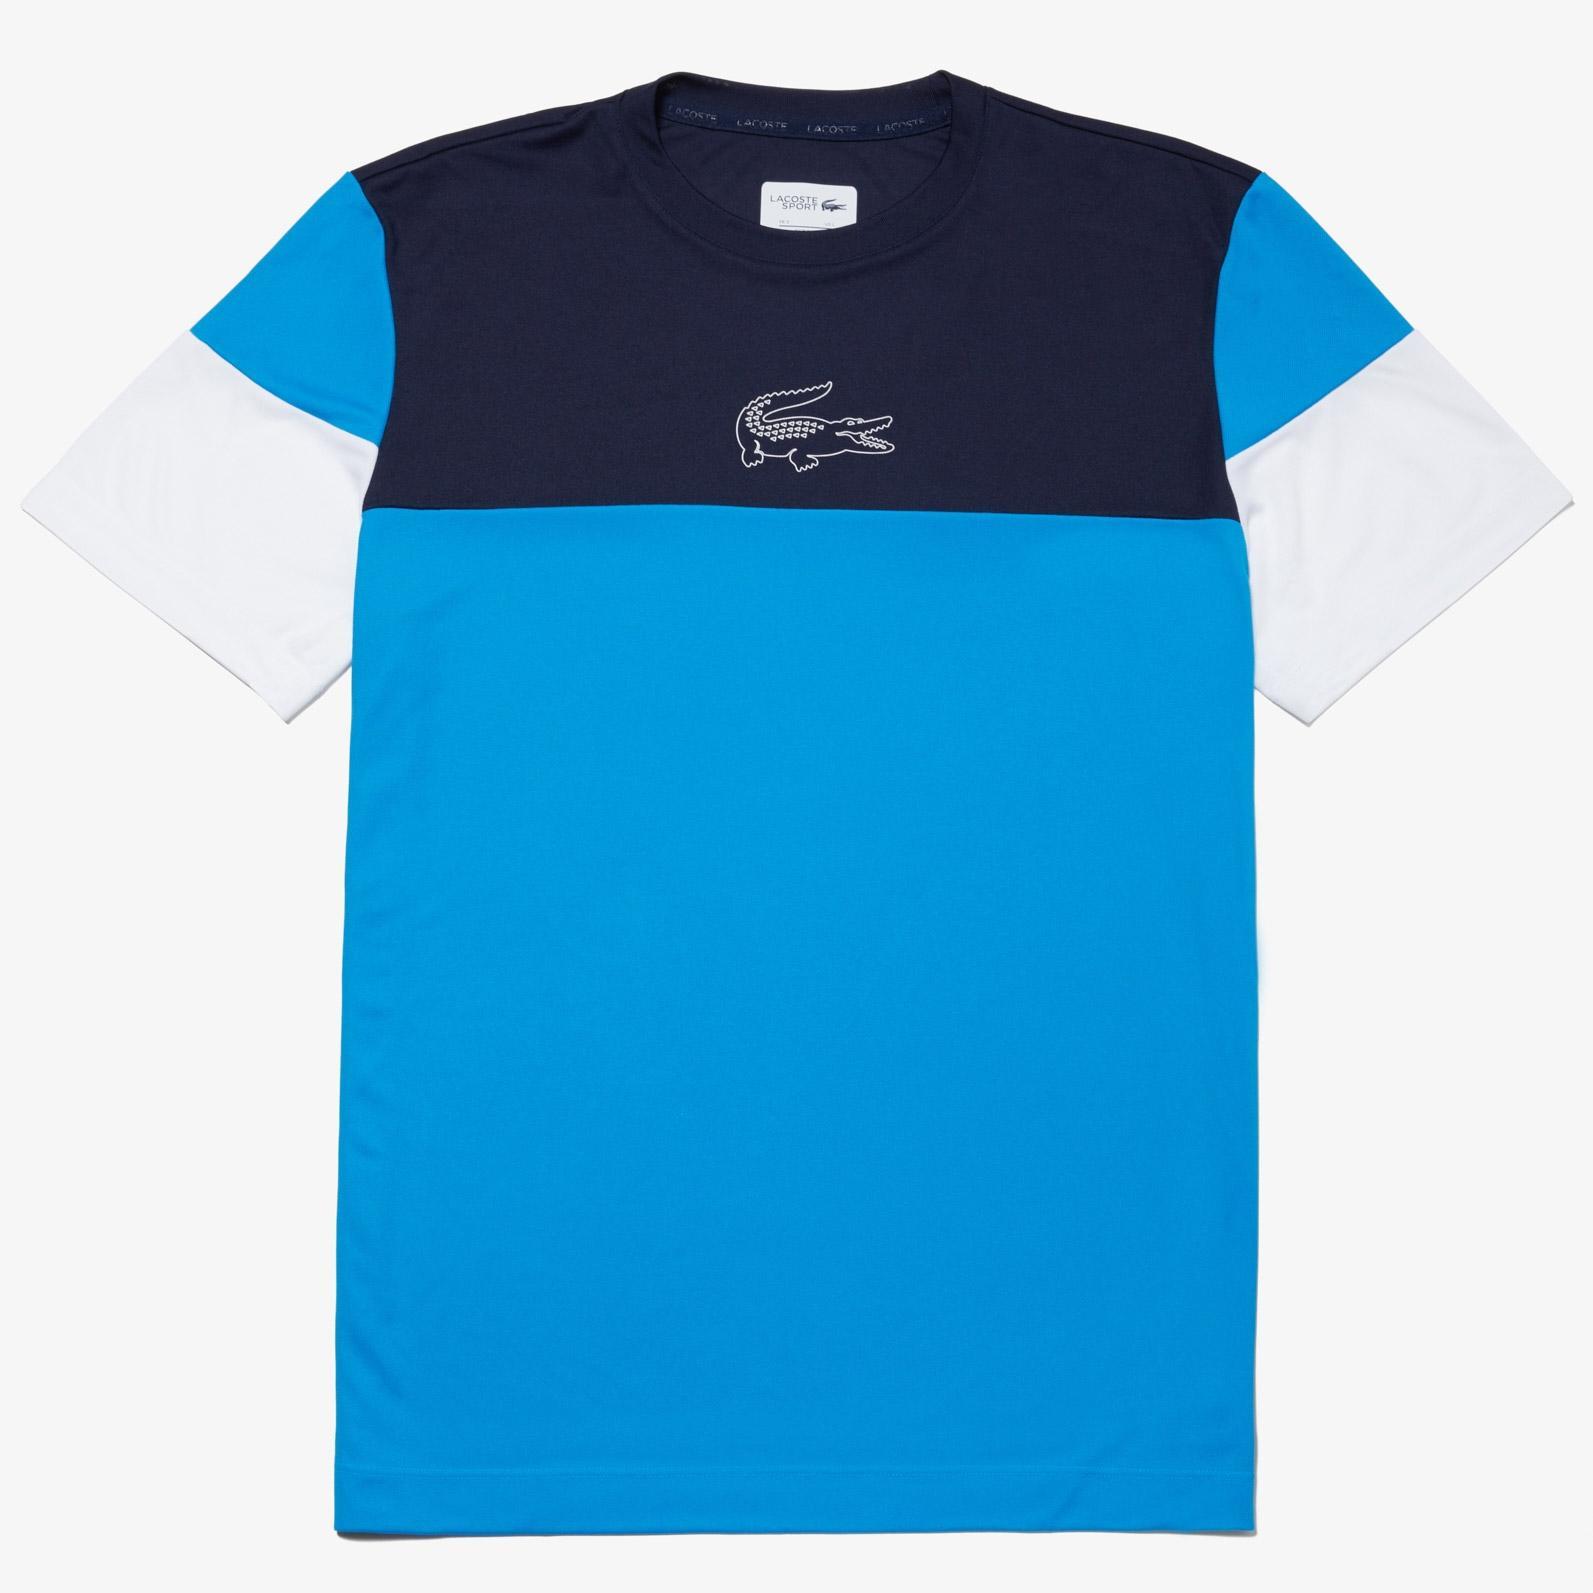 9e6808a1 Lacoste Mens Colourblock Tech Piqué T-Shirt- Navy Blue/Blue Marine/White